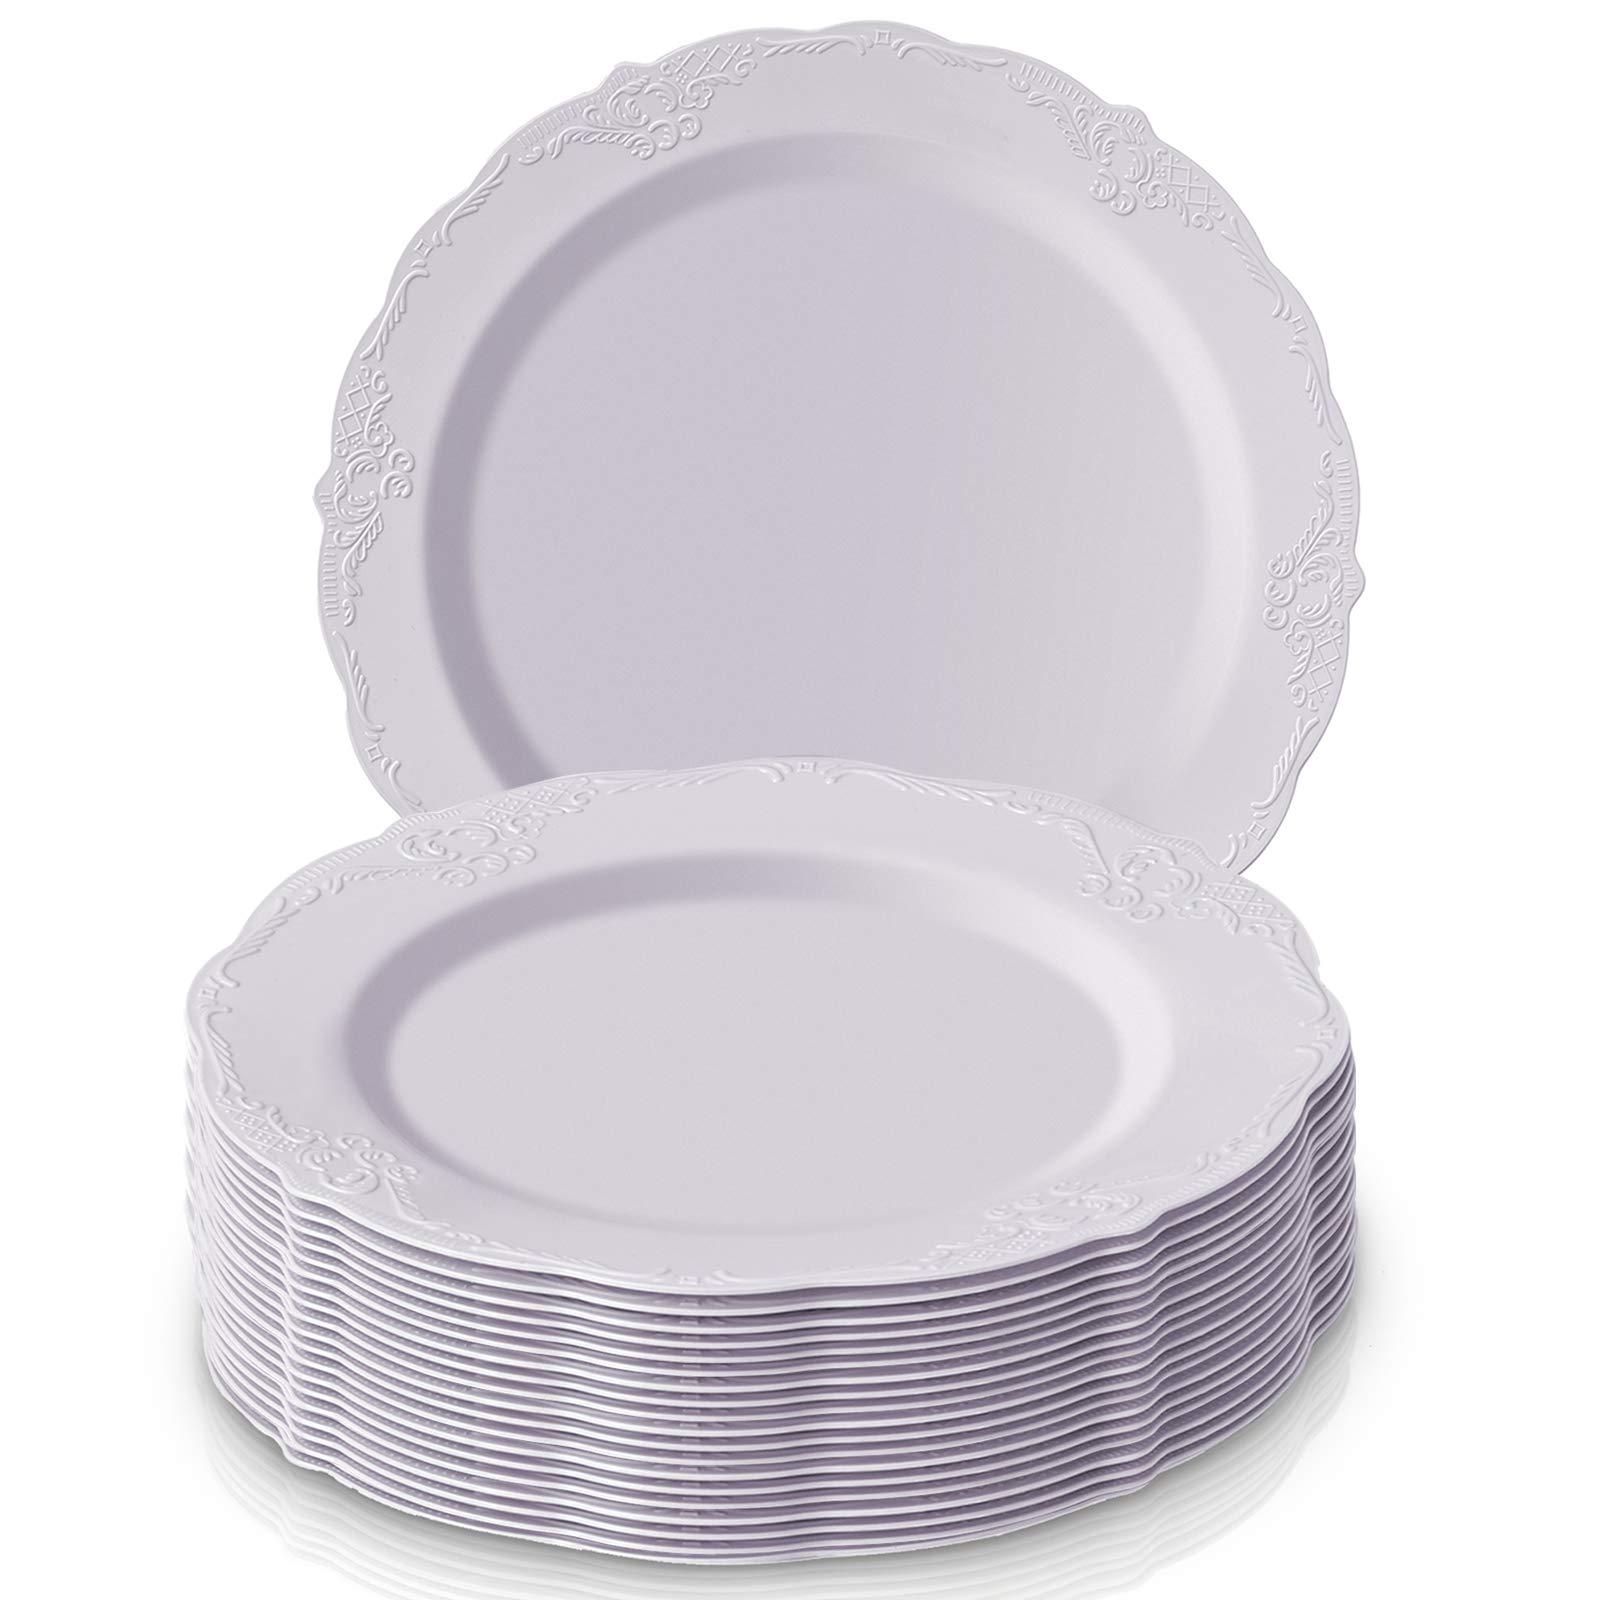 DISPOSABLE DINNERWARE SET, 20 Dinner Plates